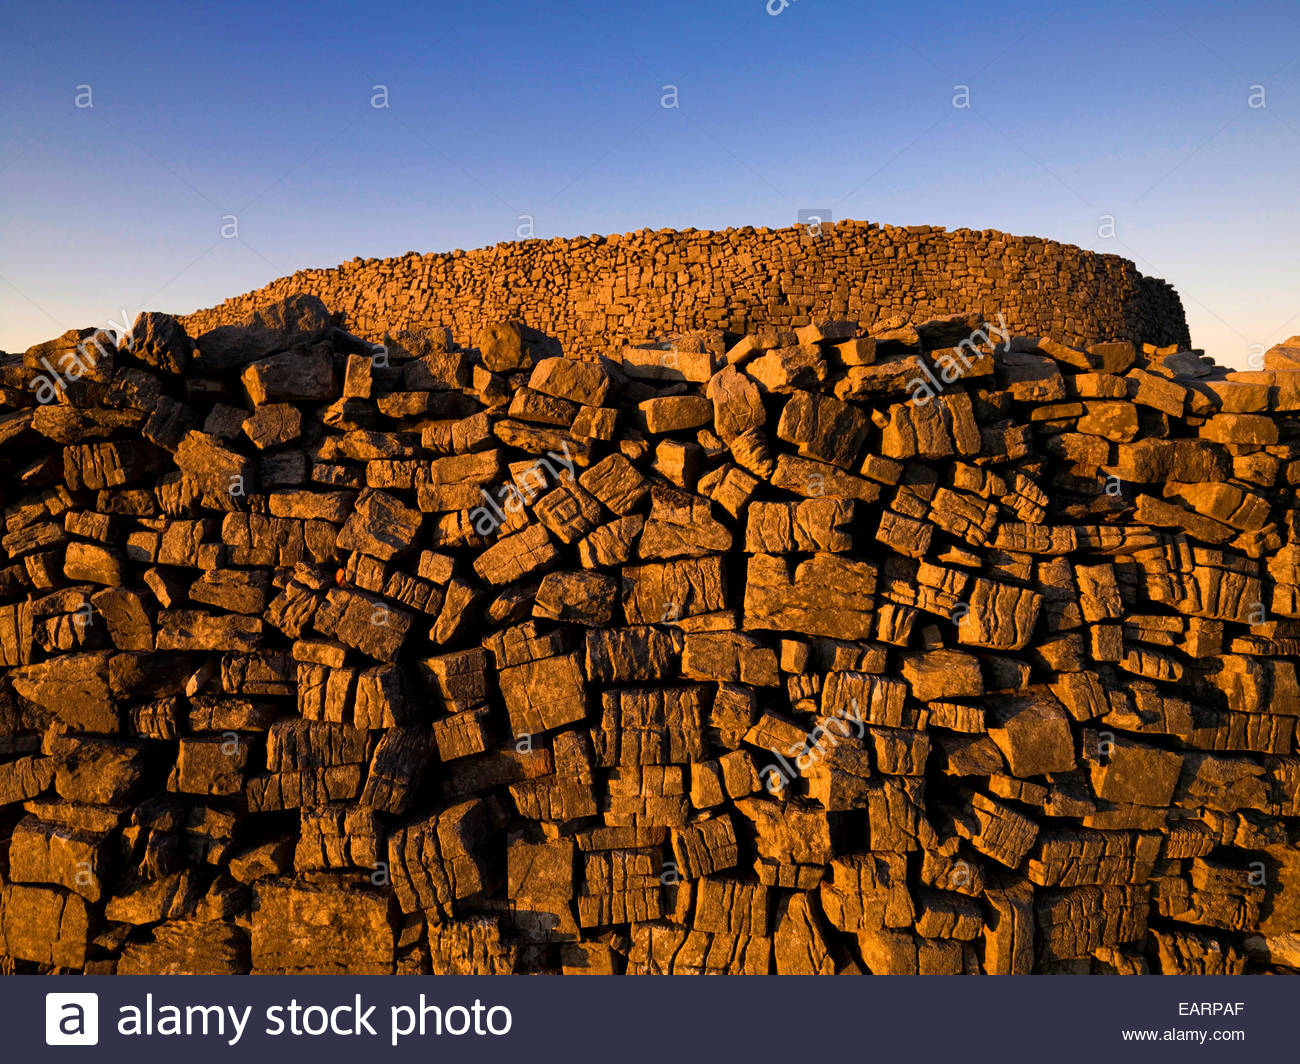 Sun setting on the Stone wall of Dun Aengus on the Aran Islands. - Stock Image